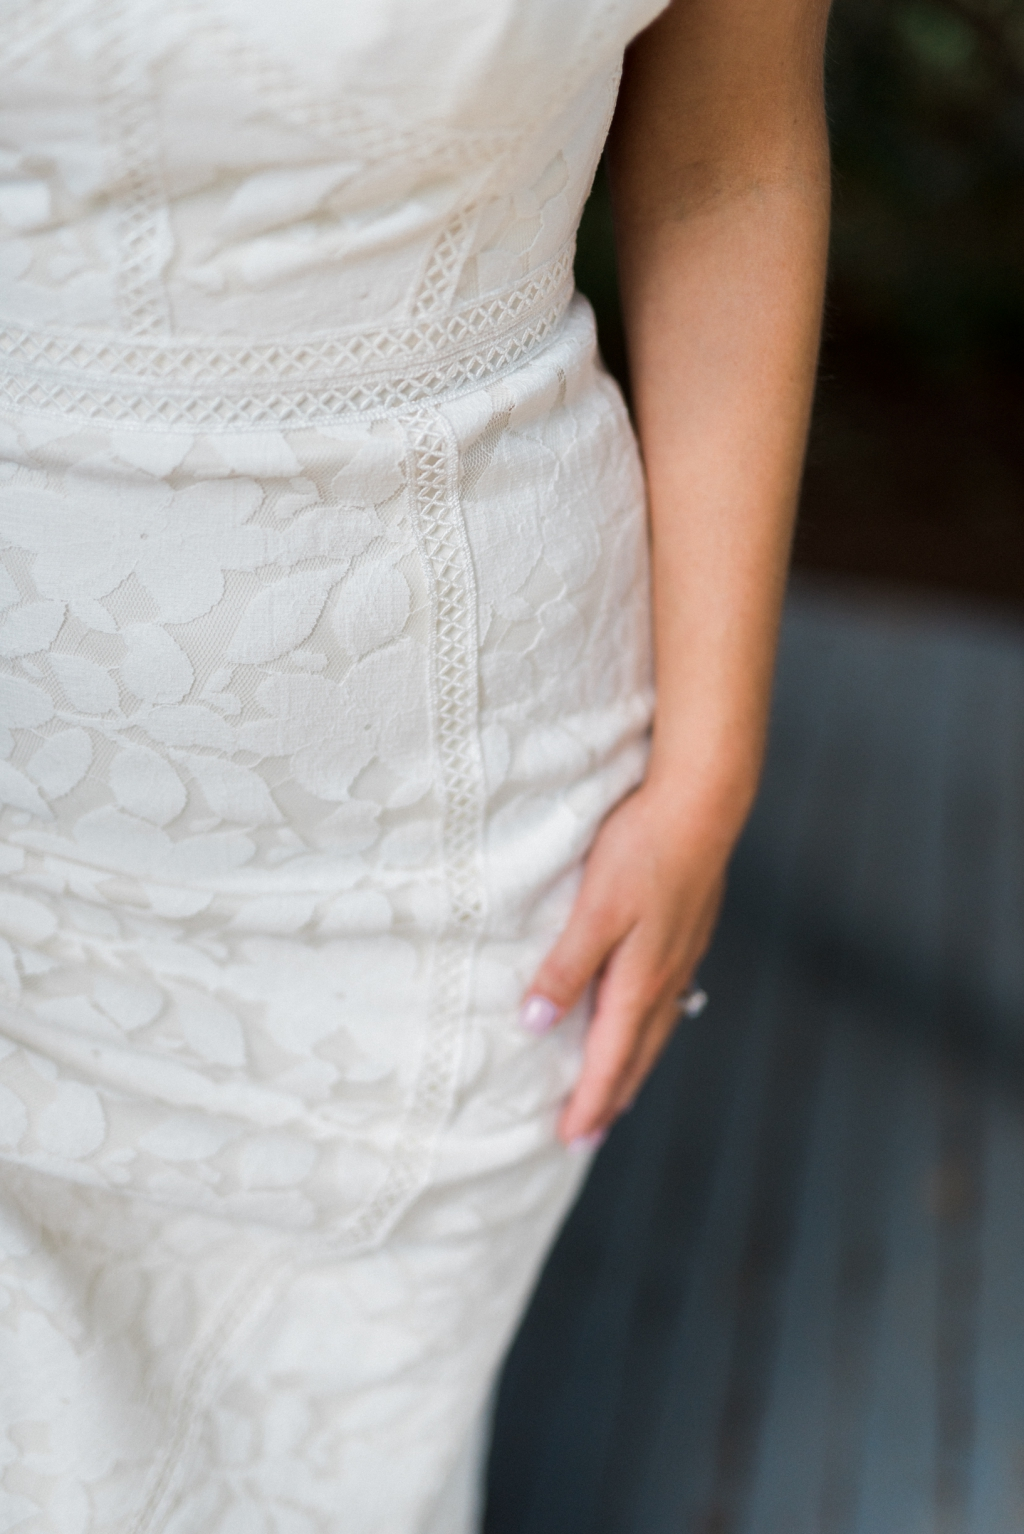 haley-richter-photography-buena-vista-confrence-center-wedding-summer-090